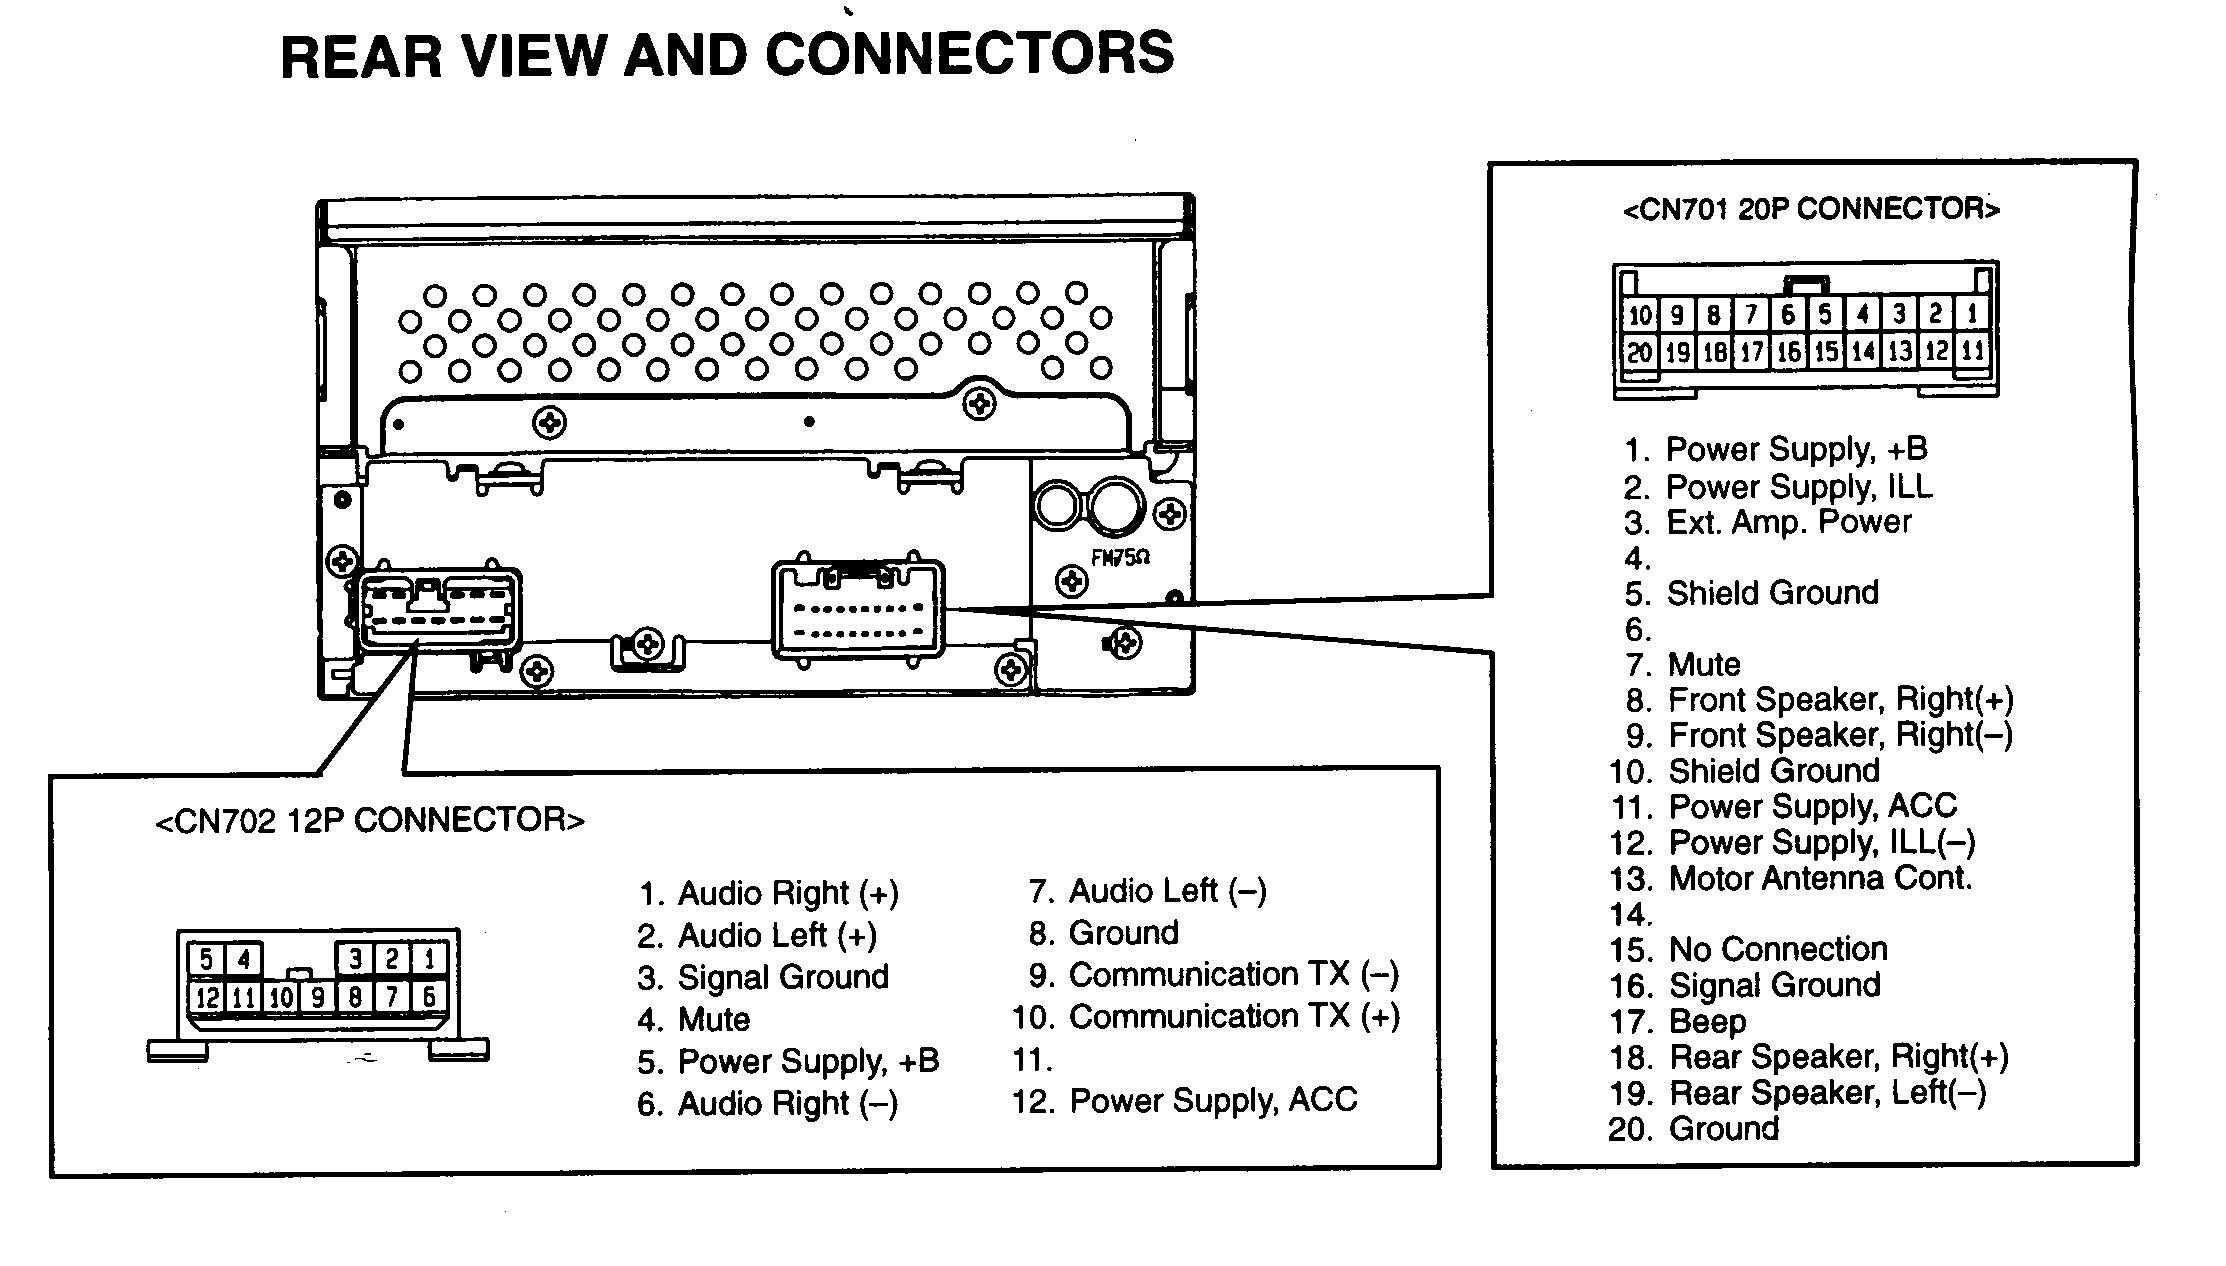 1996 toyota Corolla Engine Diagram A Amp E 82 toyota Corolla Wiring Diagram Wiring Schematic Diagram Of 1996 toyota Corolla Engine Diagram